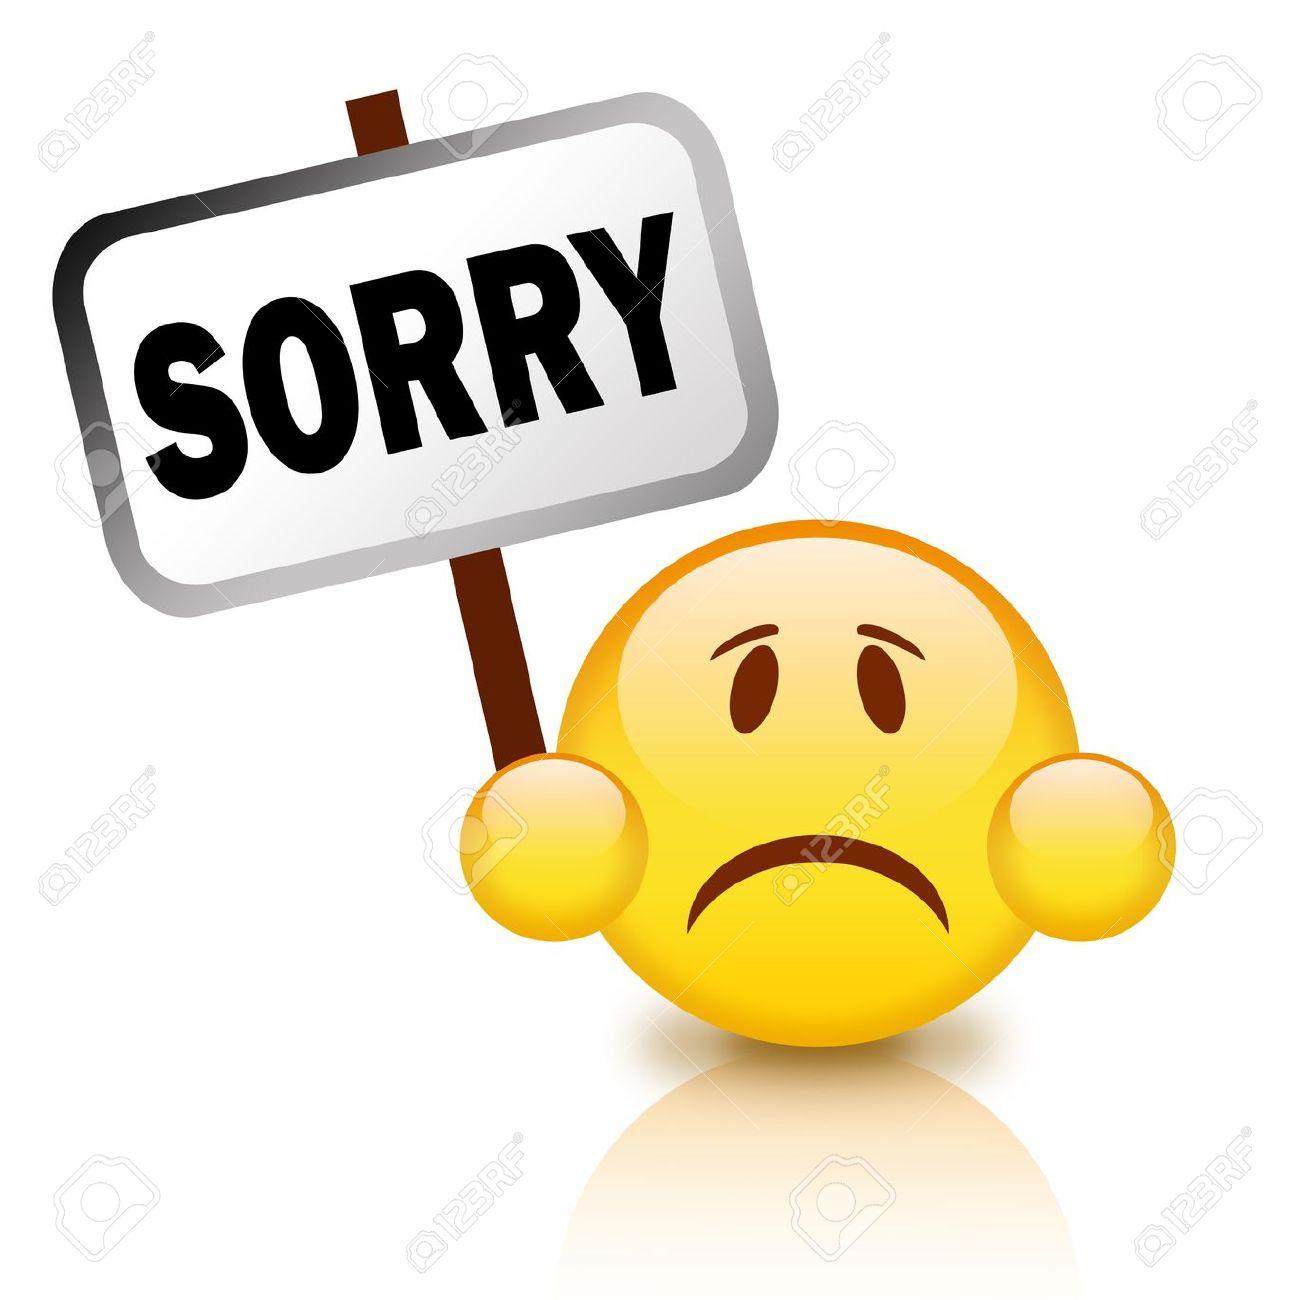 Sorry emoticon Stock Photo - 9718593